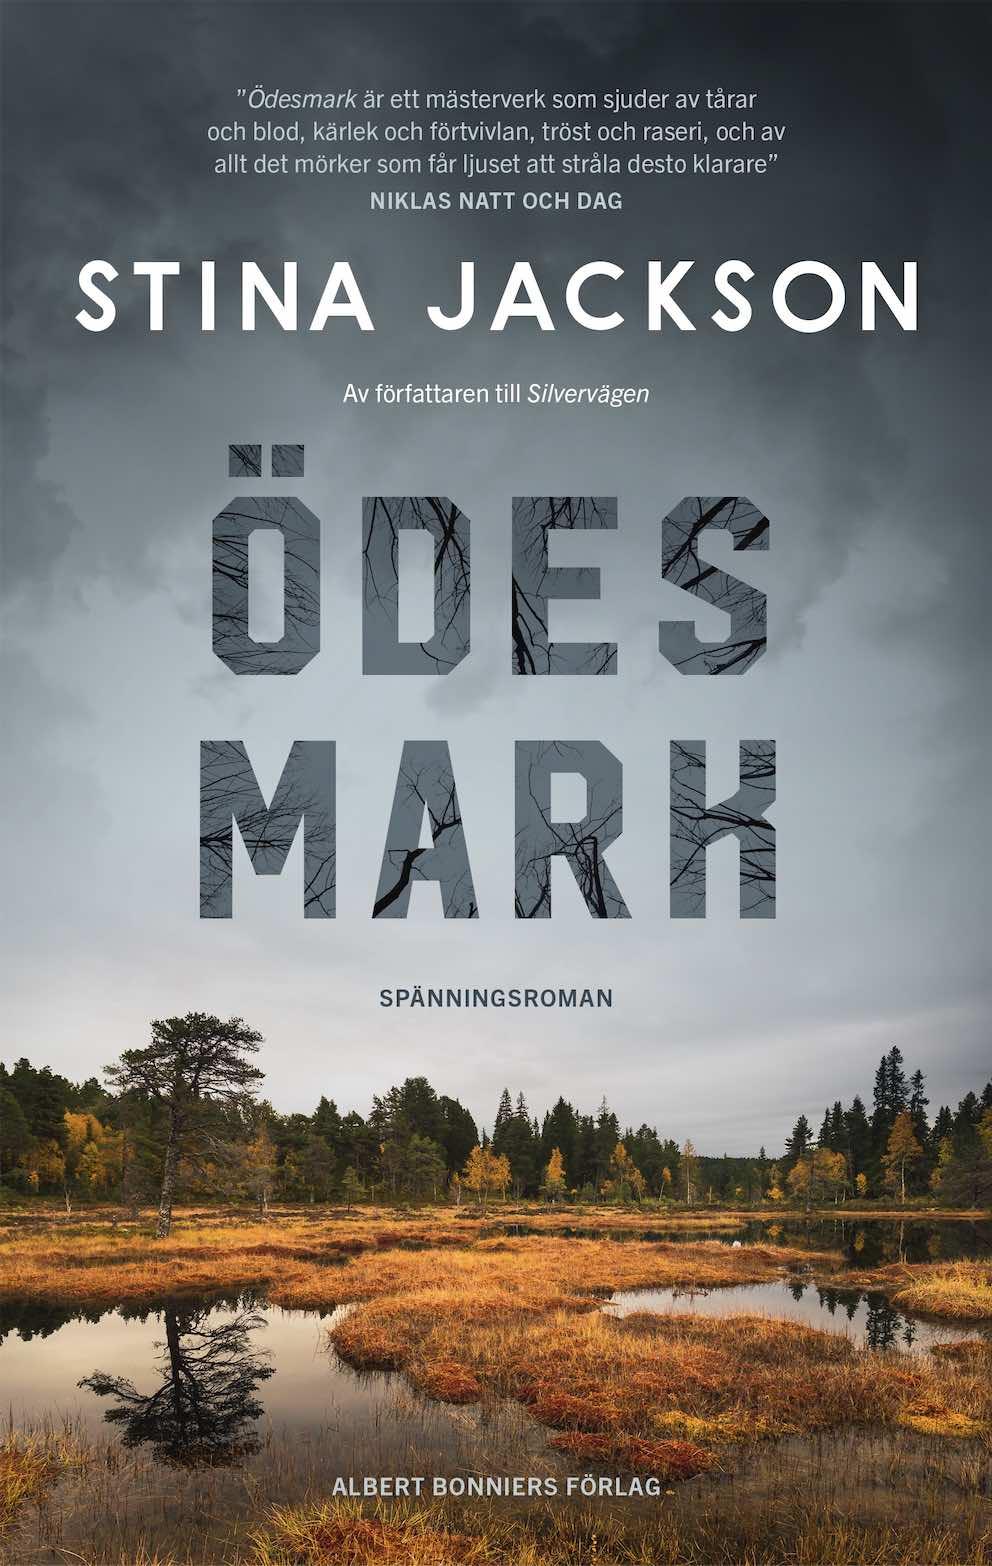 Ödesmark årets bok